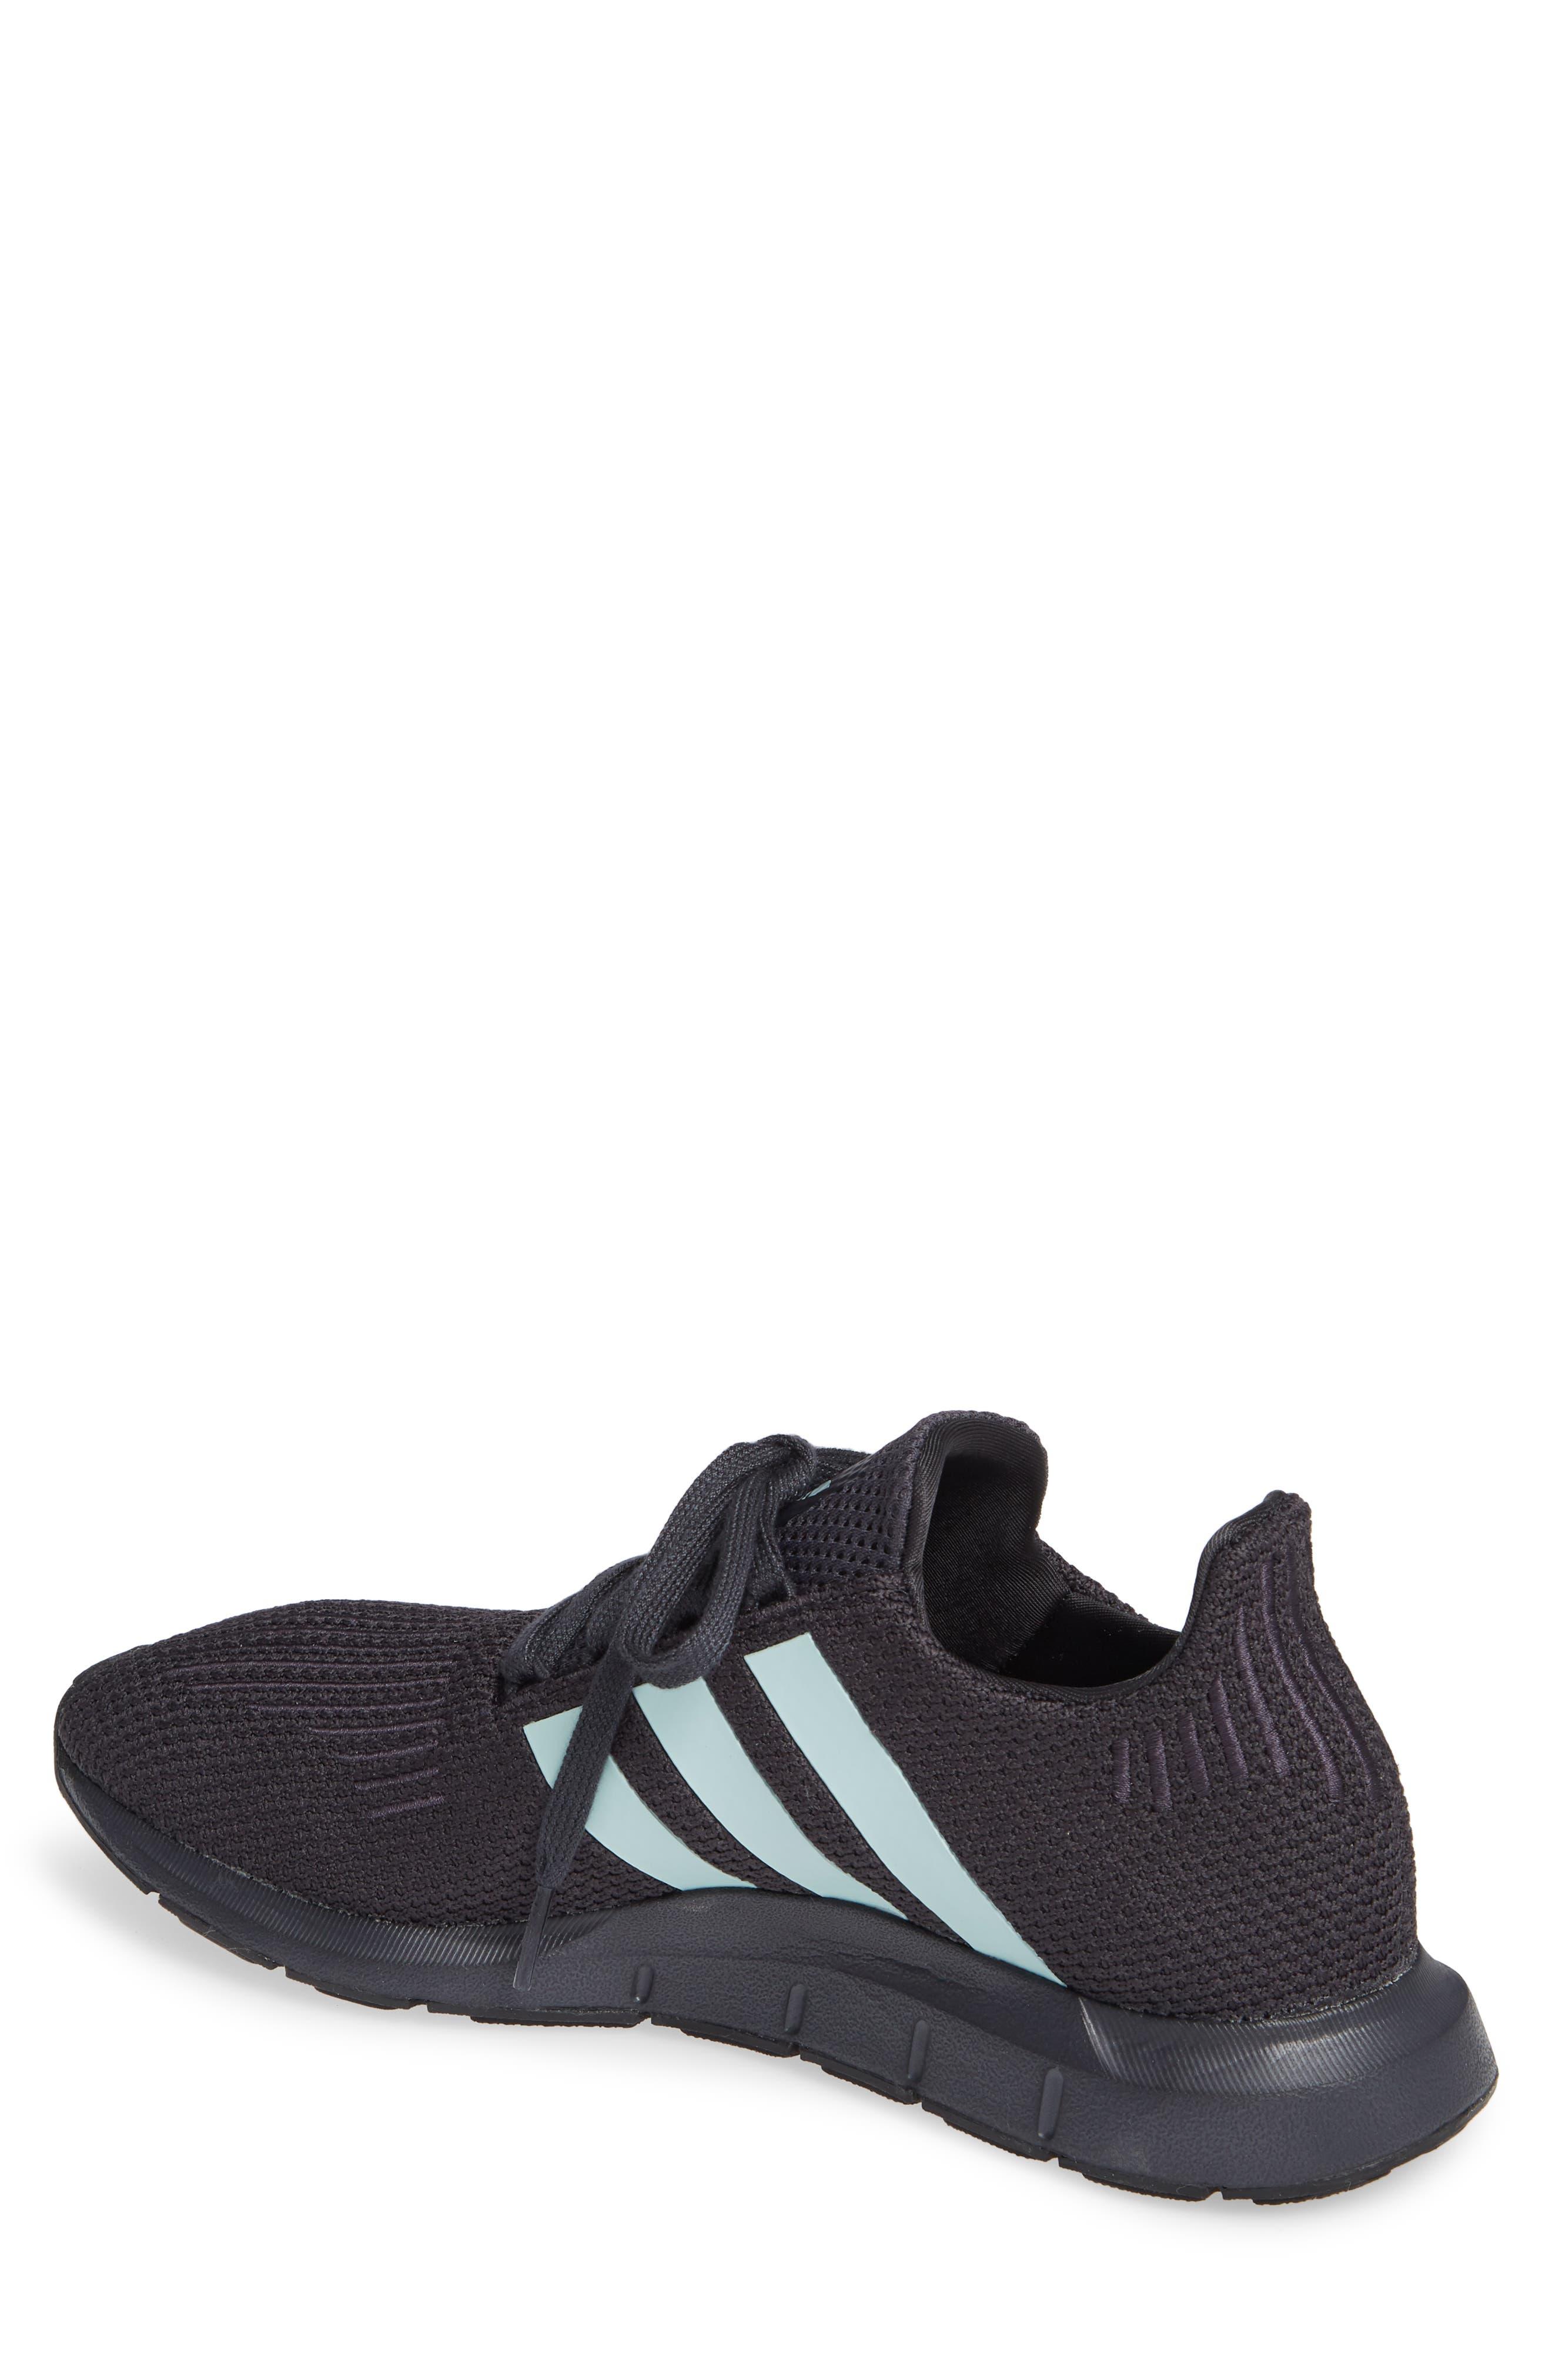 Swift Run Running Shoe,                             Alternate thumbnail 2, color,                             GREY/ GREEN/ BLACK